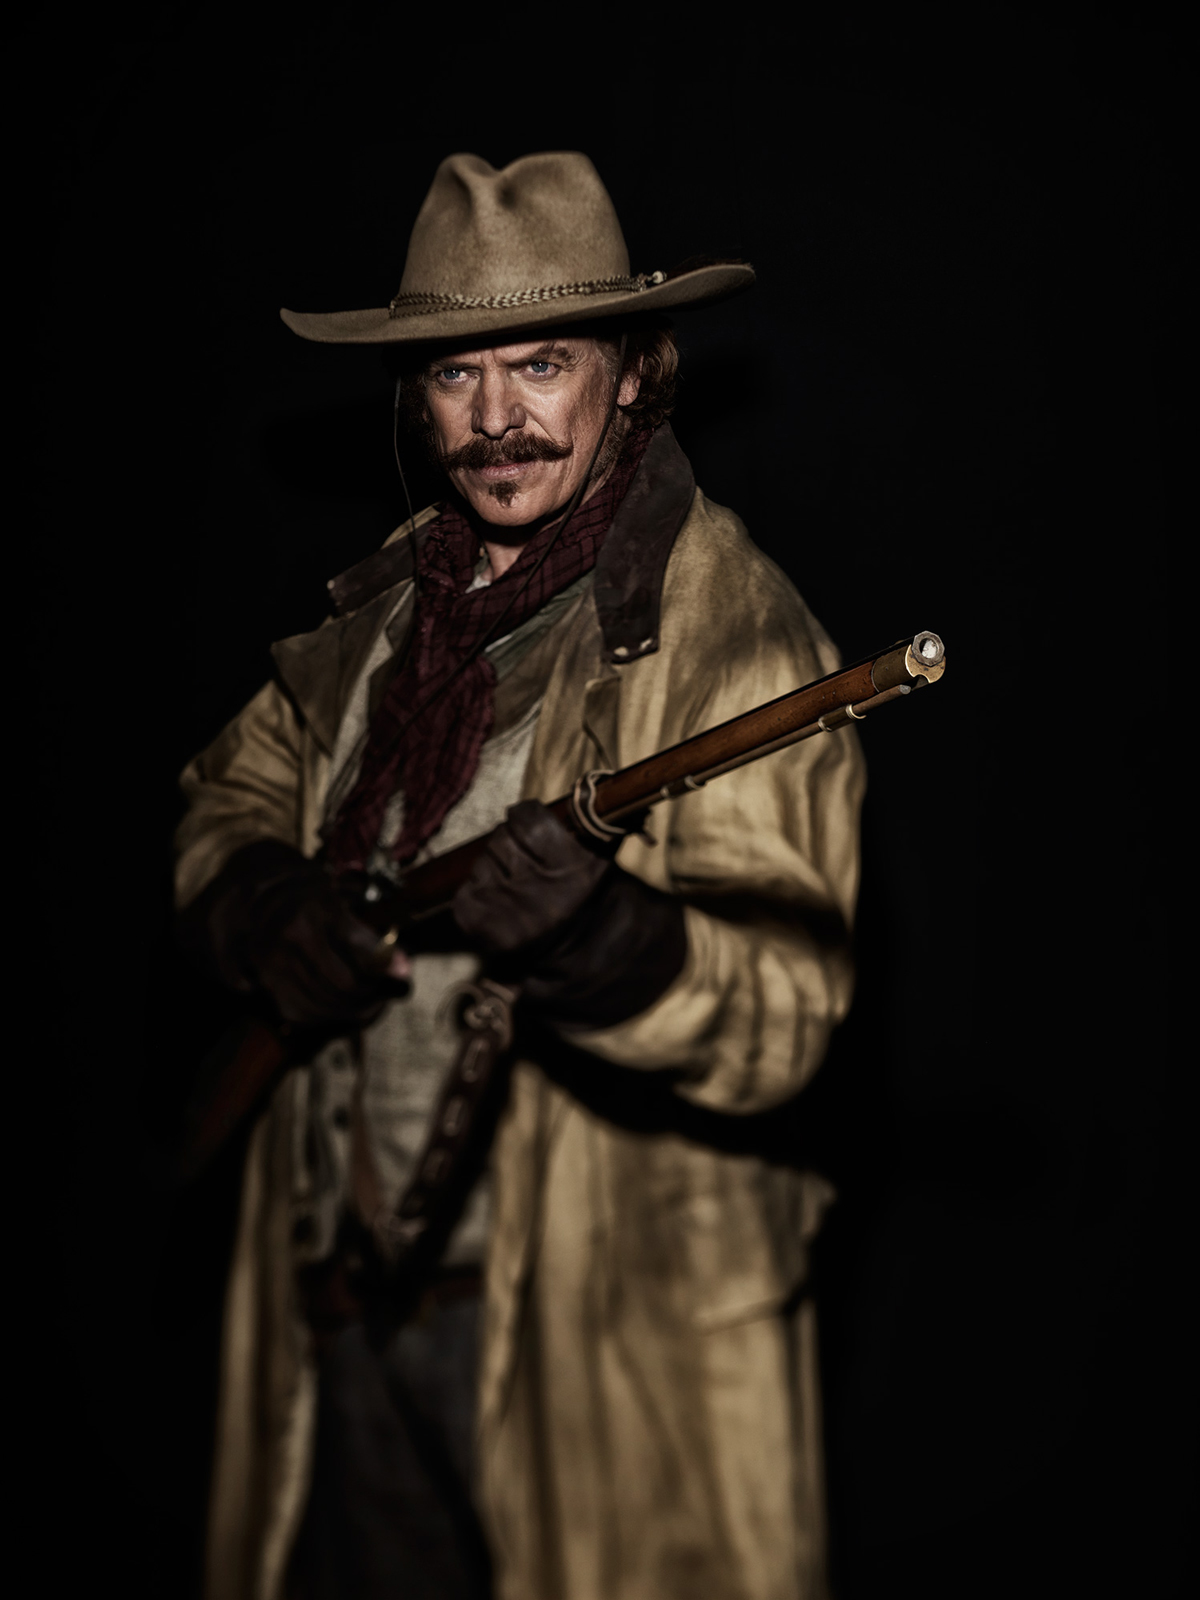 TV_History_TexasRising_KevinLynch-Portrait05.jpg